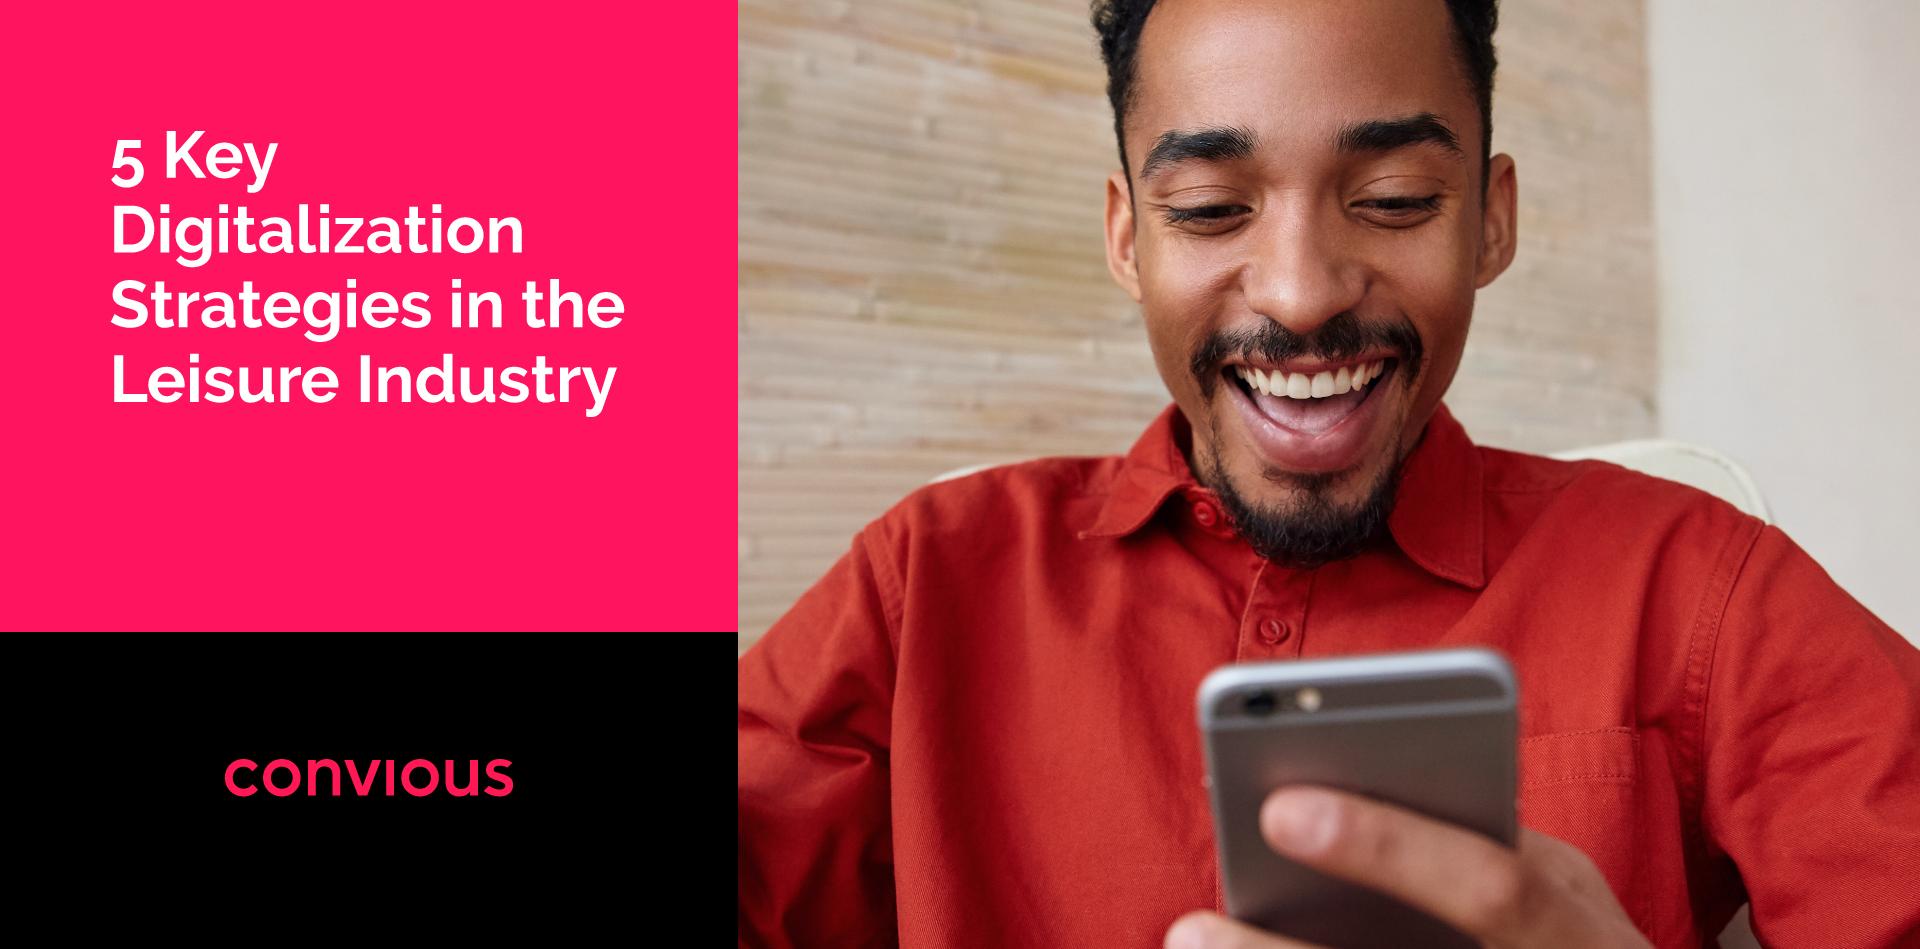 5 Key Digitalization Strategies in the Leisure Industry